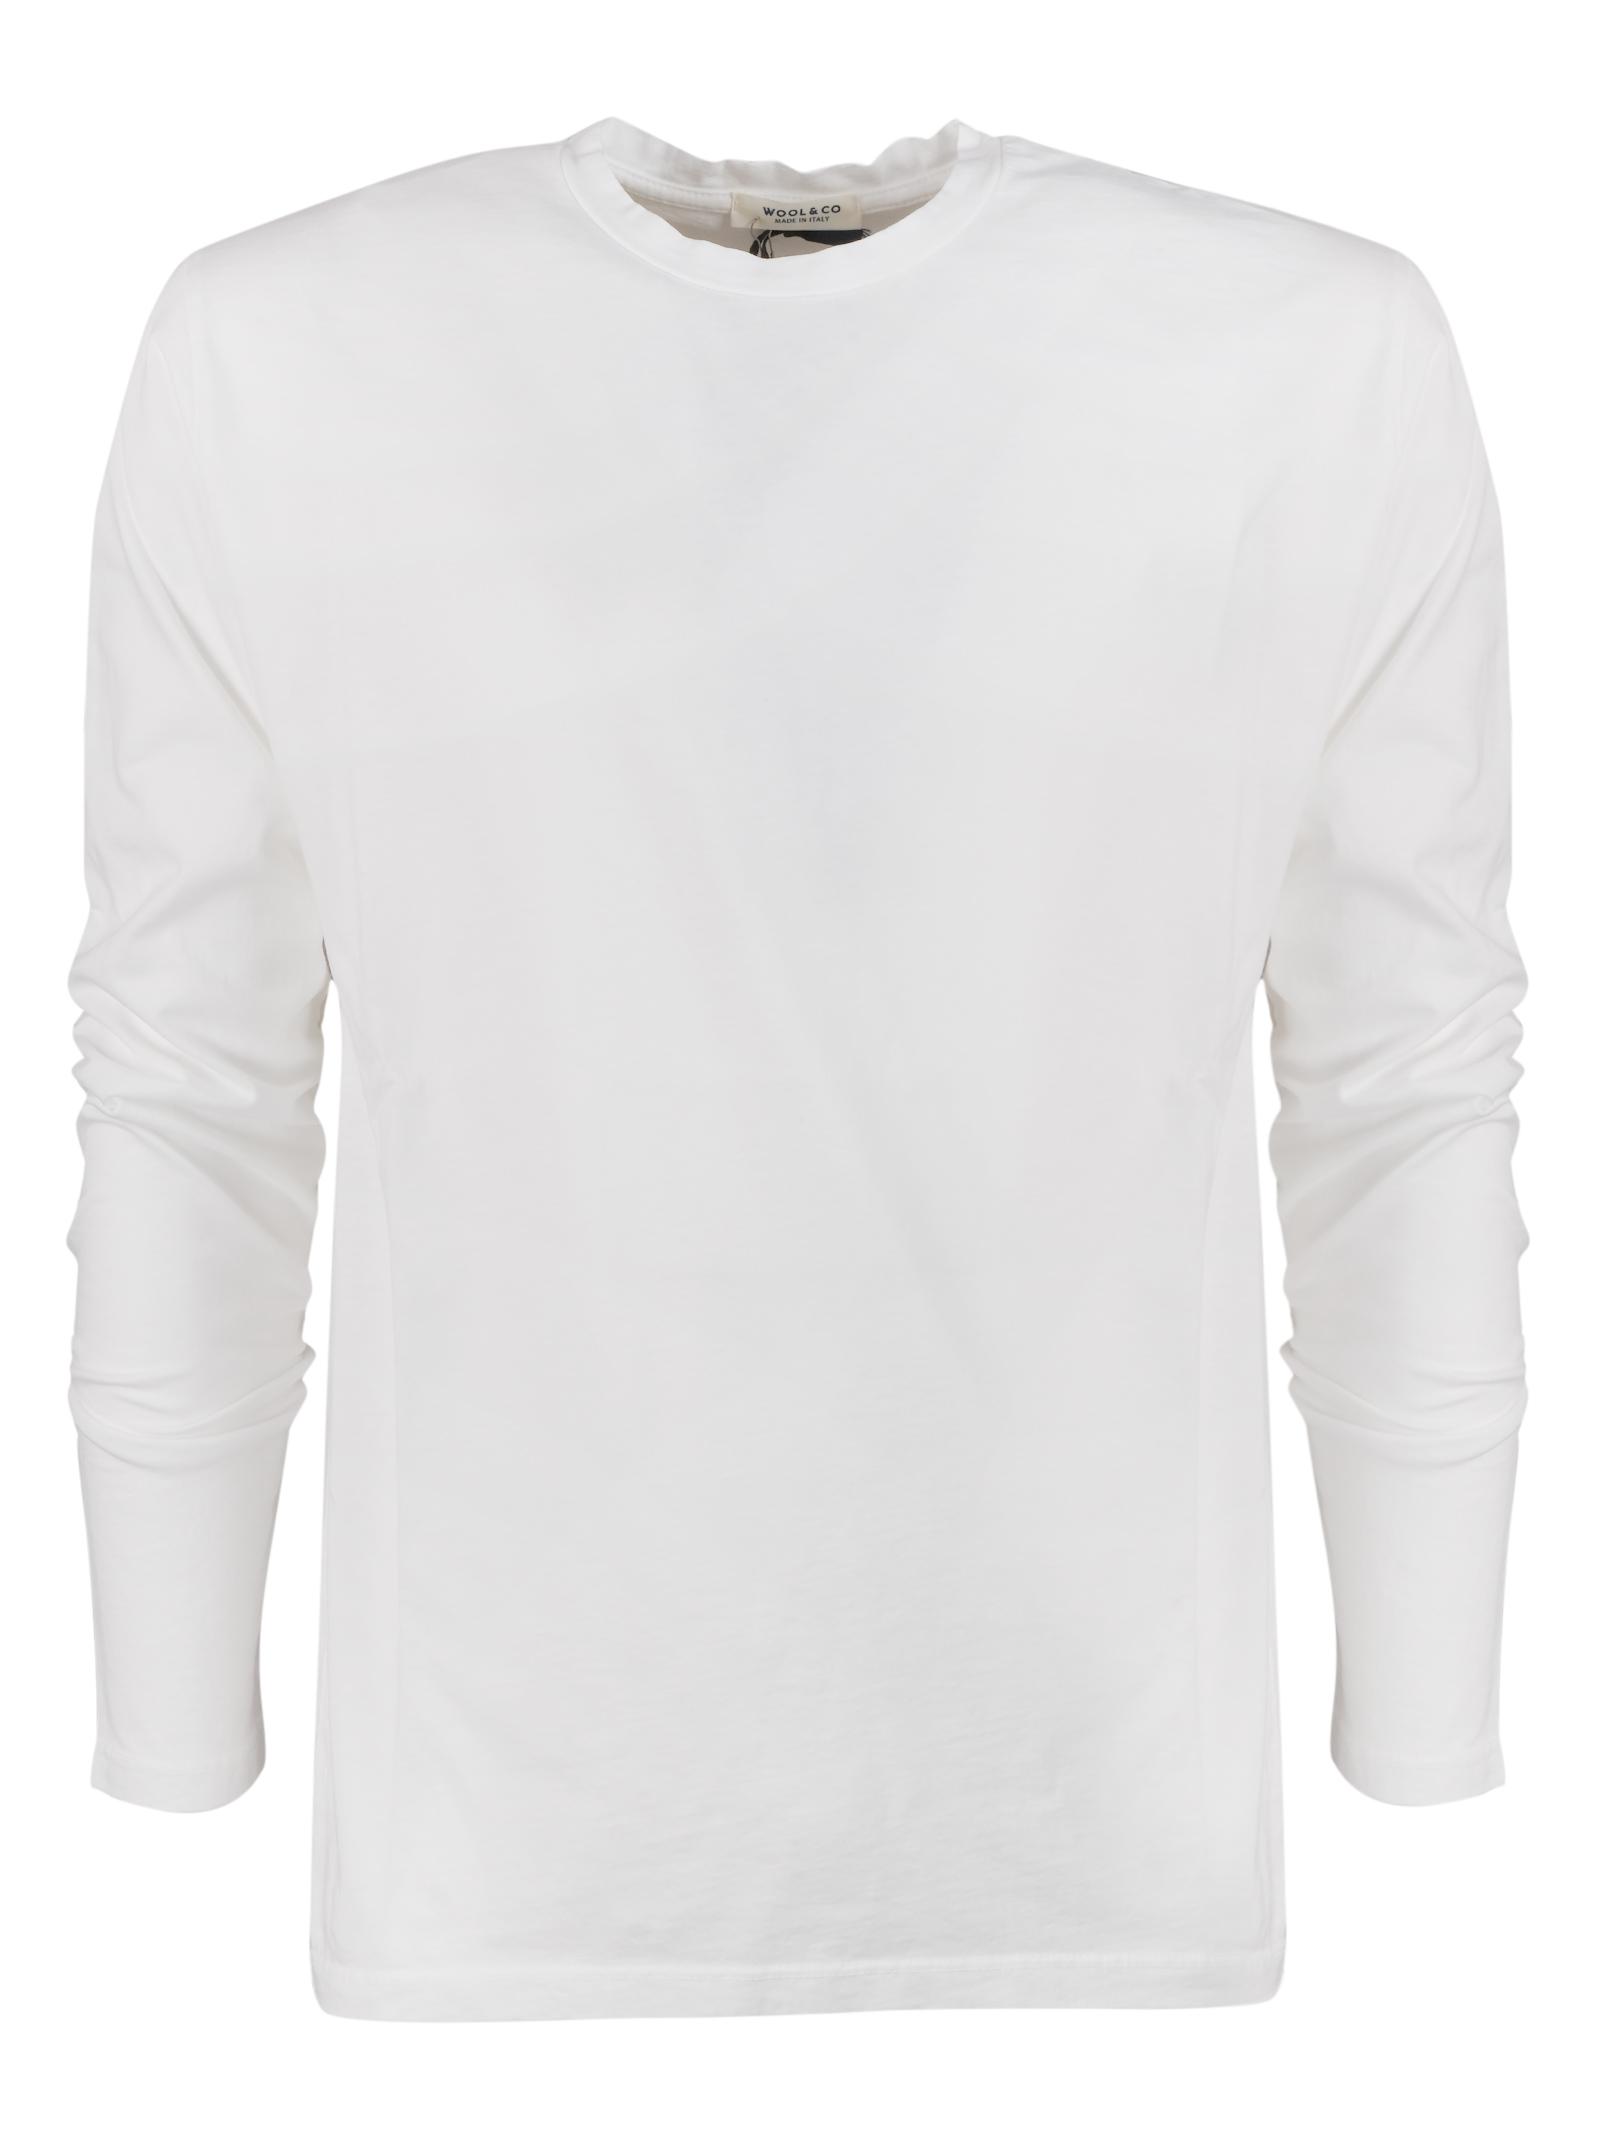 t-shirt manica lunga WOOL & CO.   T- shirt   082601